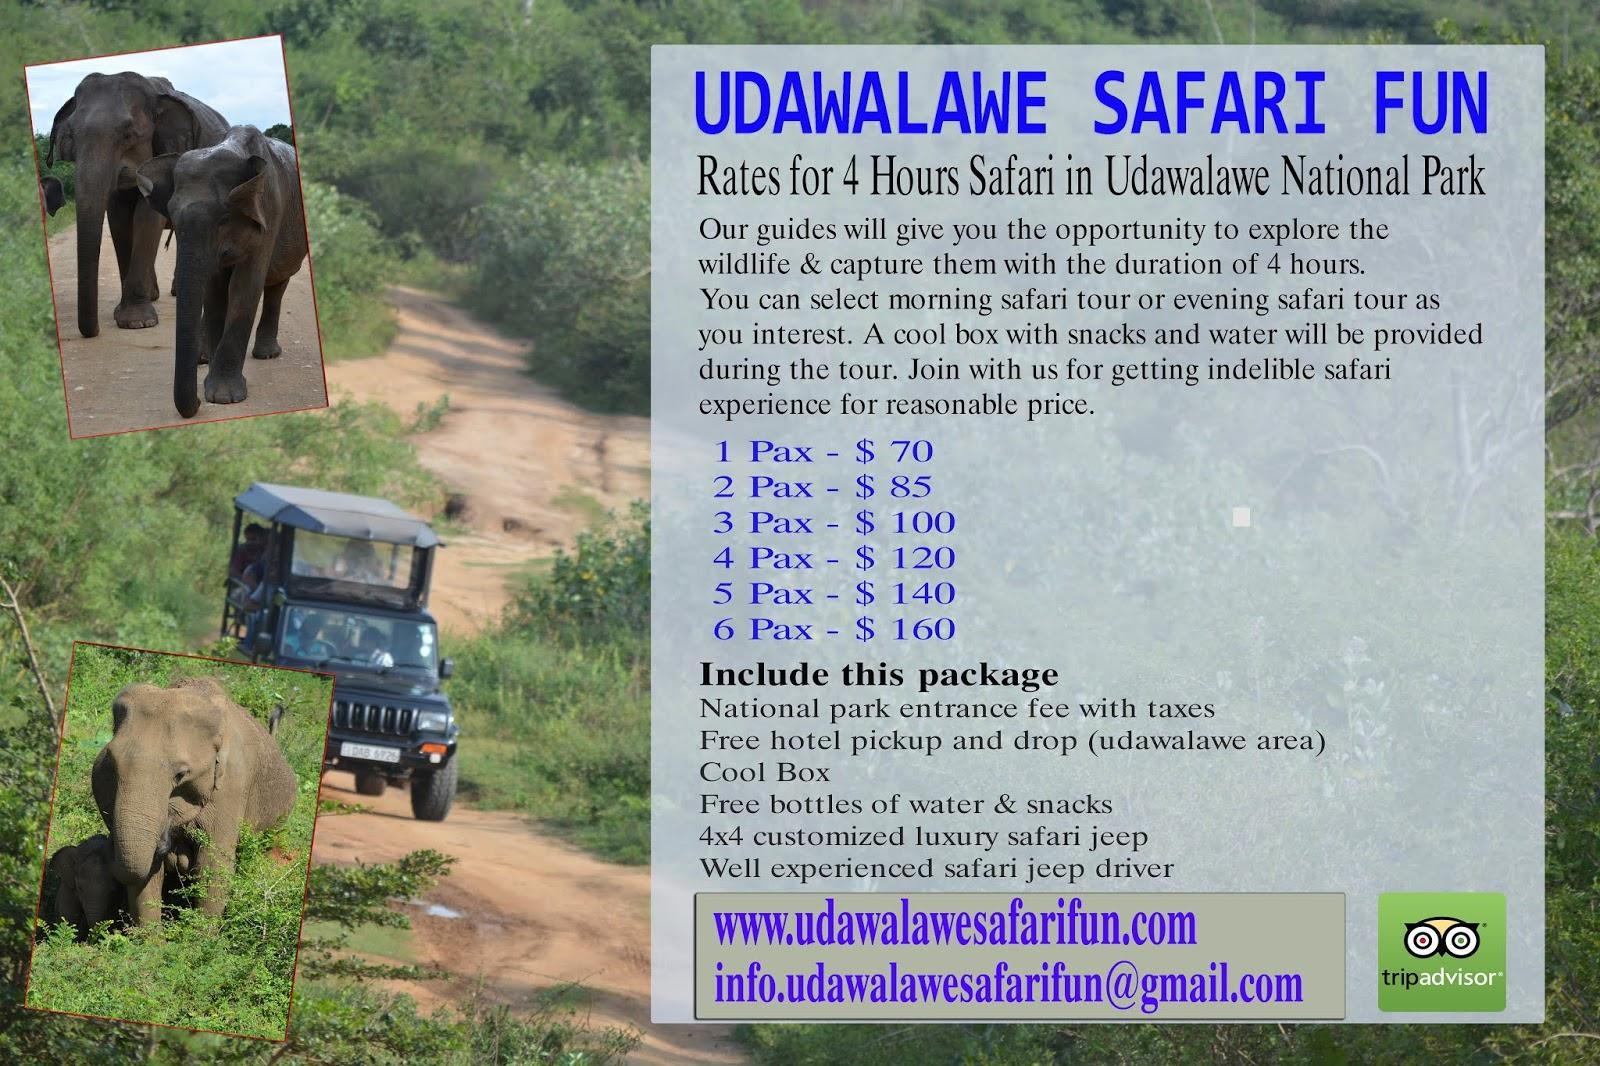 Udawalawe national park safari prices including entrance fee and